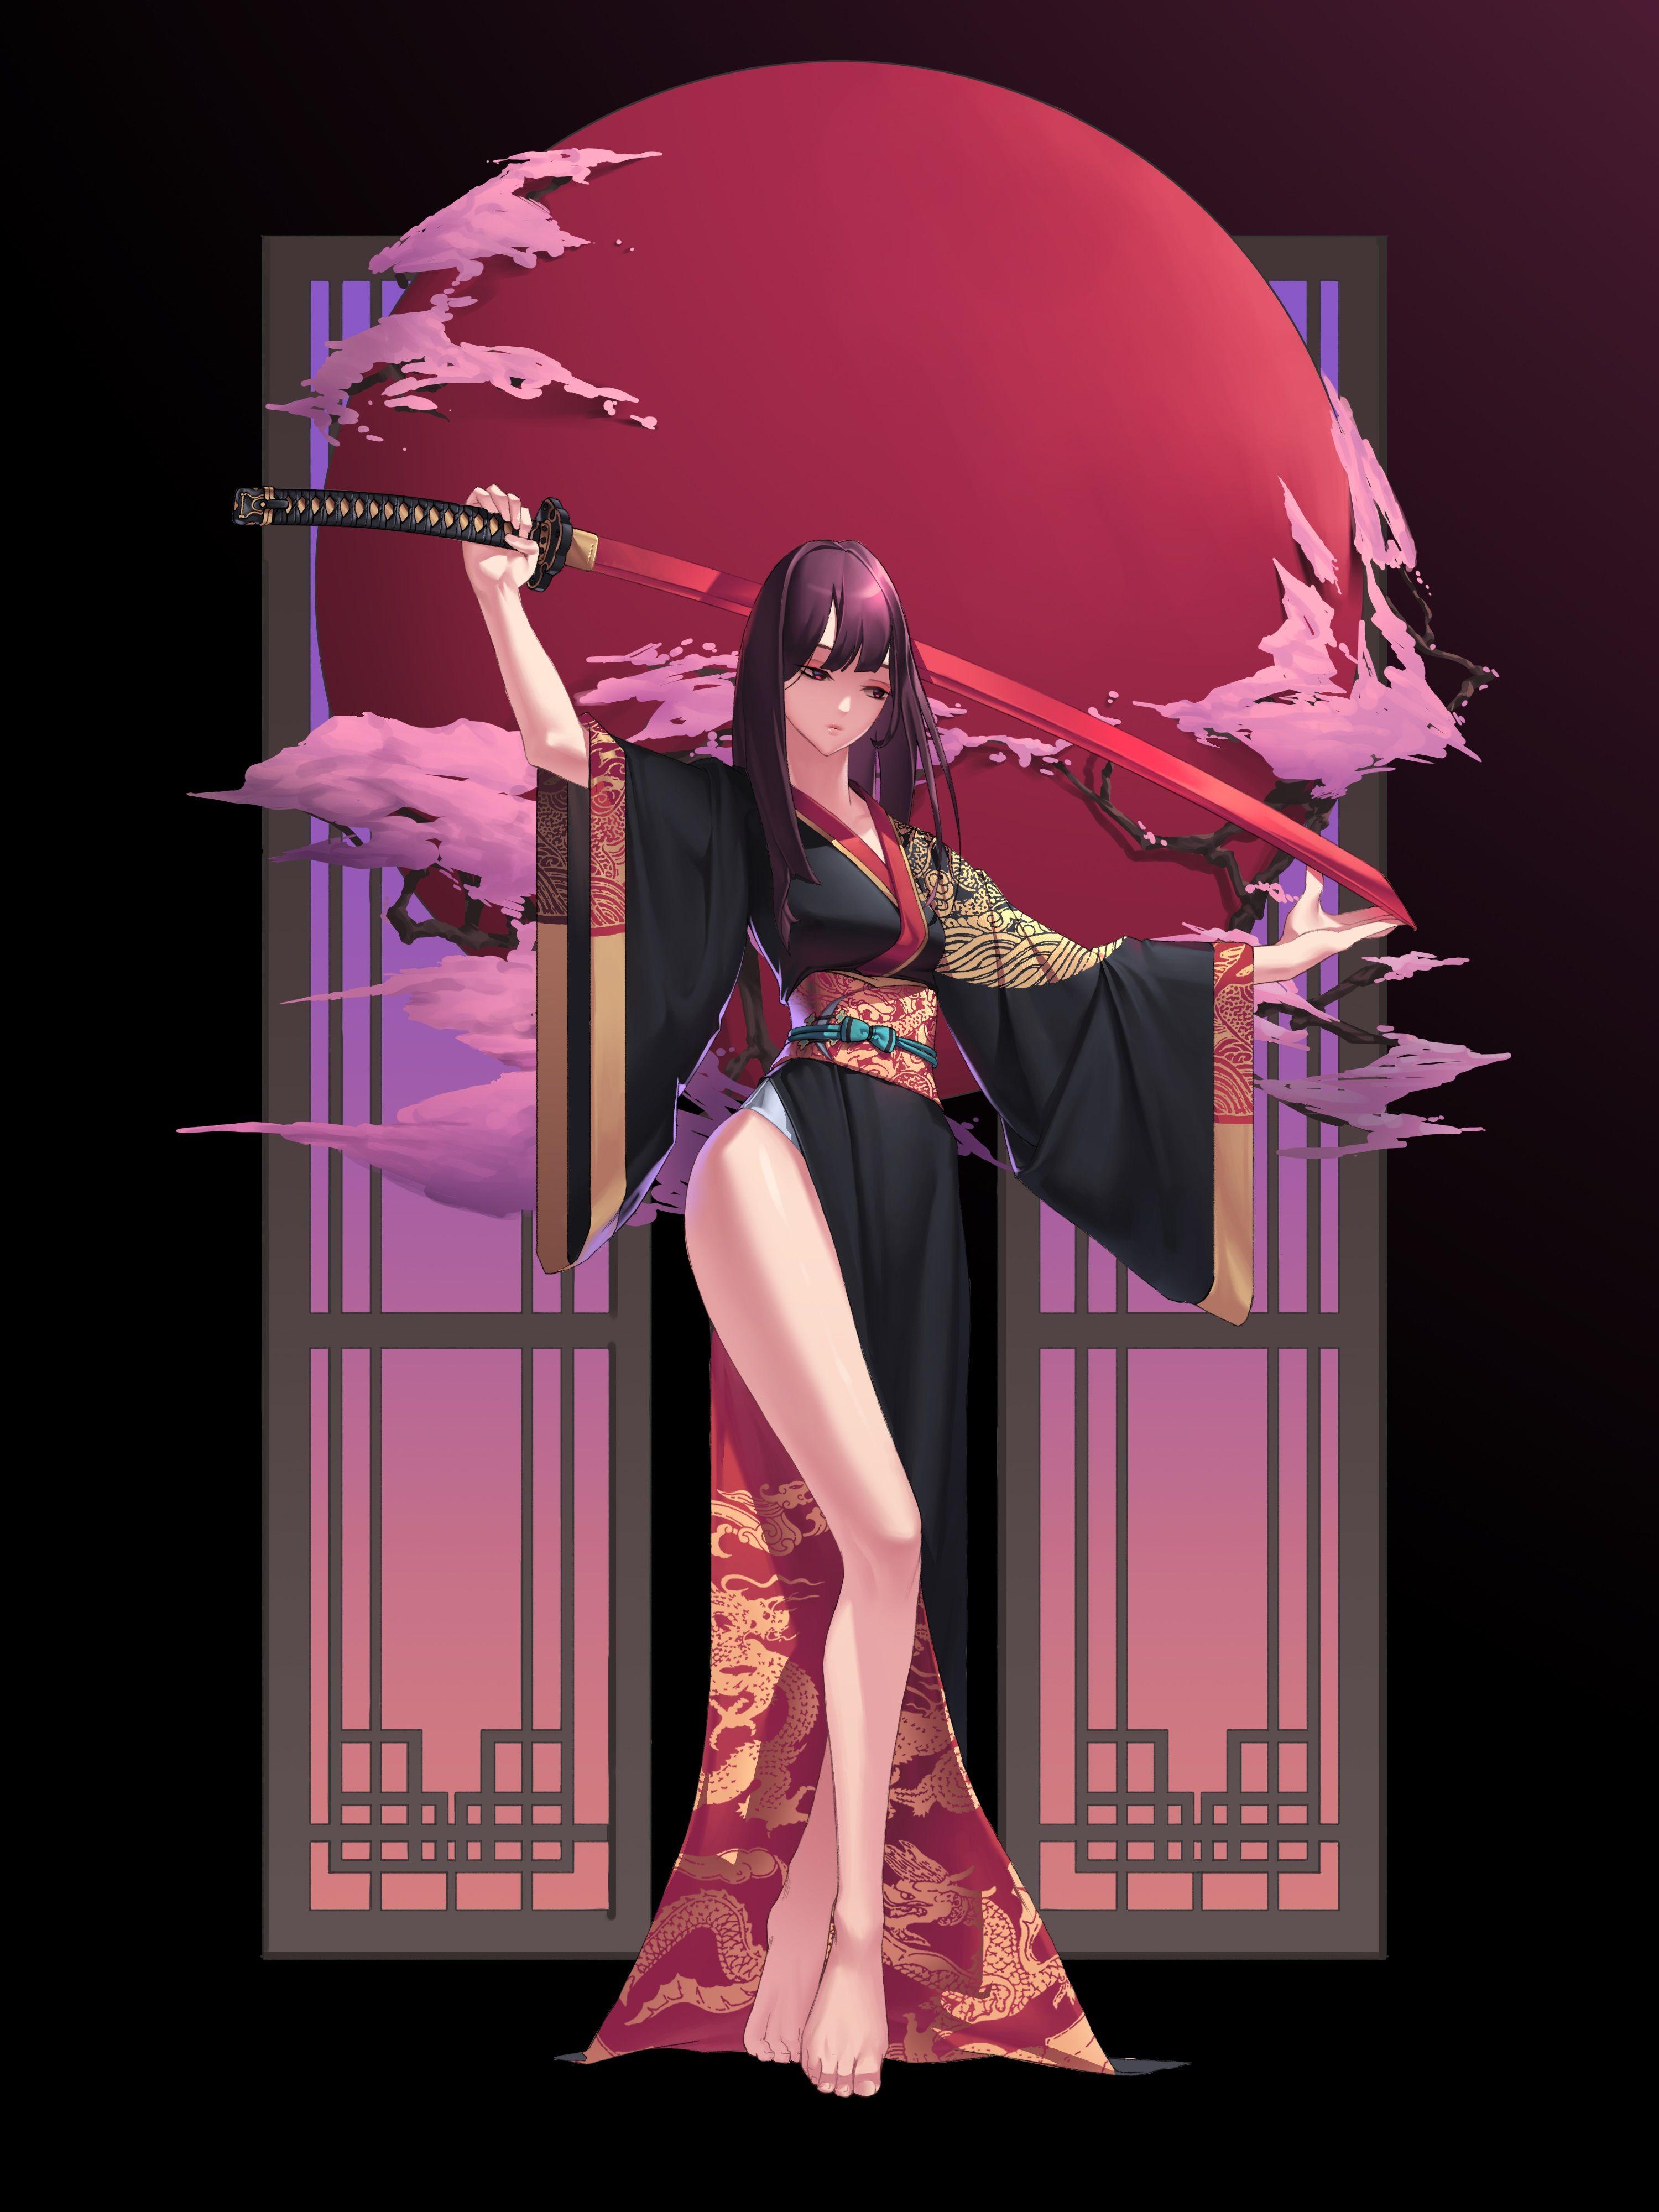 Pin By Maira Zurakoski On Rpg Female Character 22 Samurai Art Anime Kimono Anime Art Girl